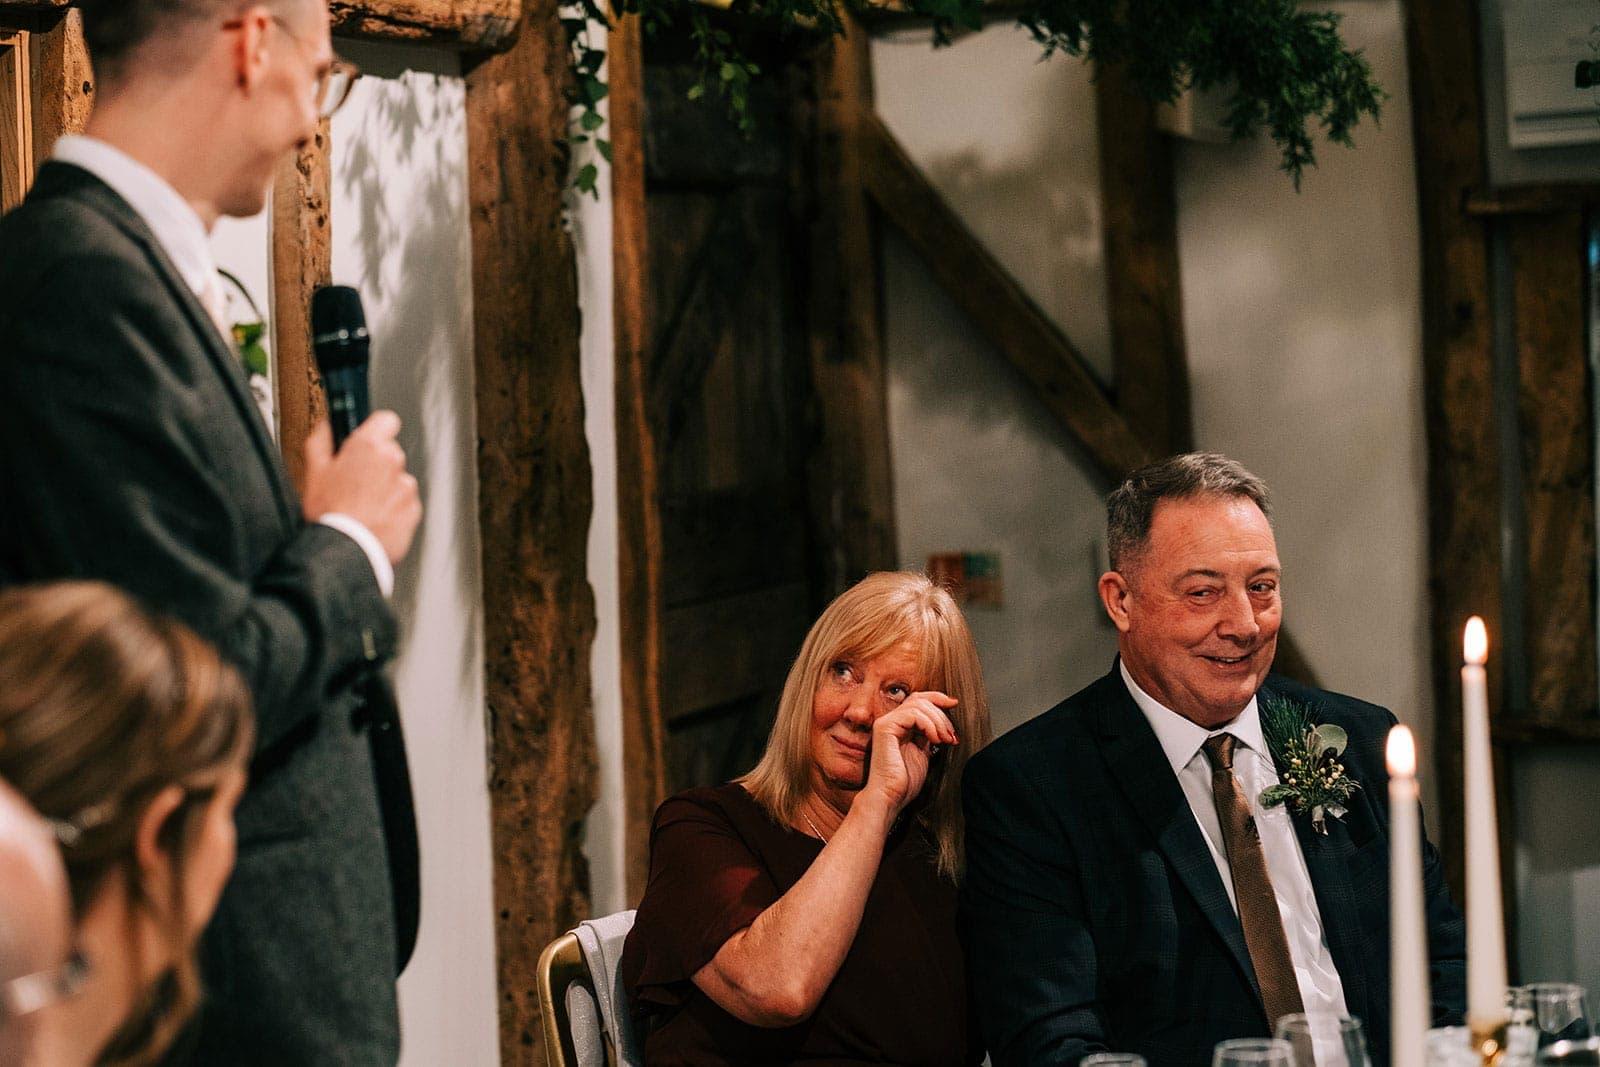 Steve's mum gets emotional during his speech